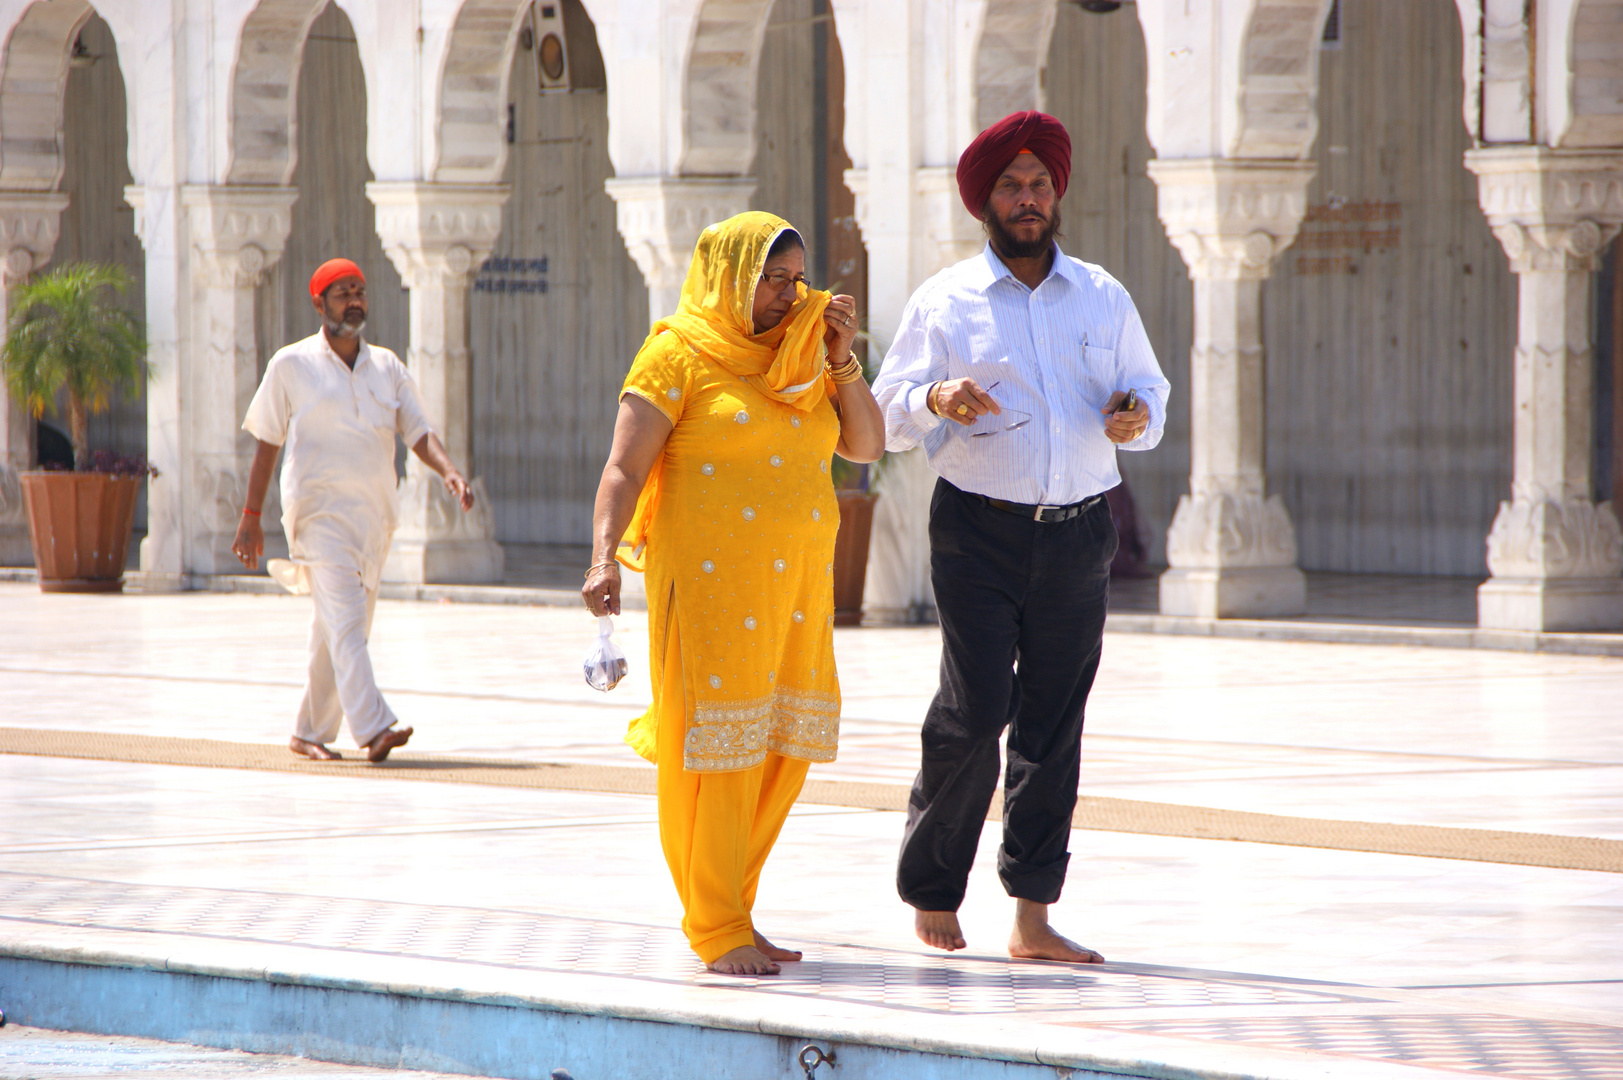 Praktizierender Sikh